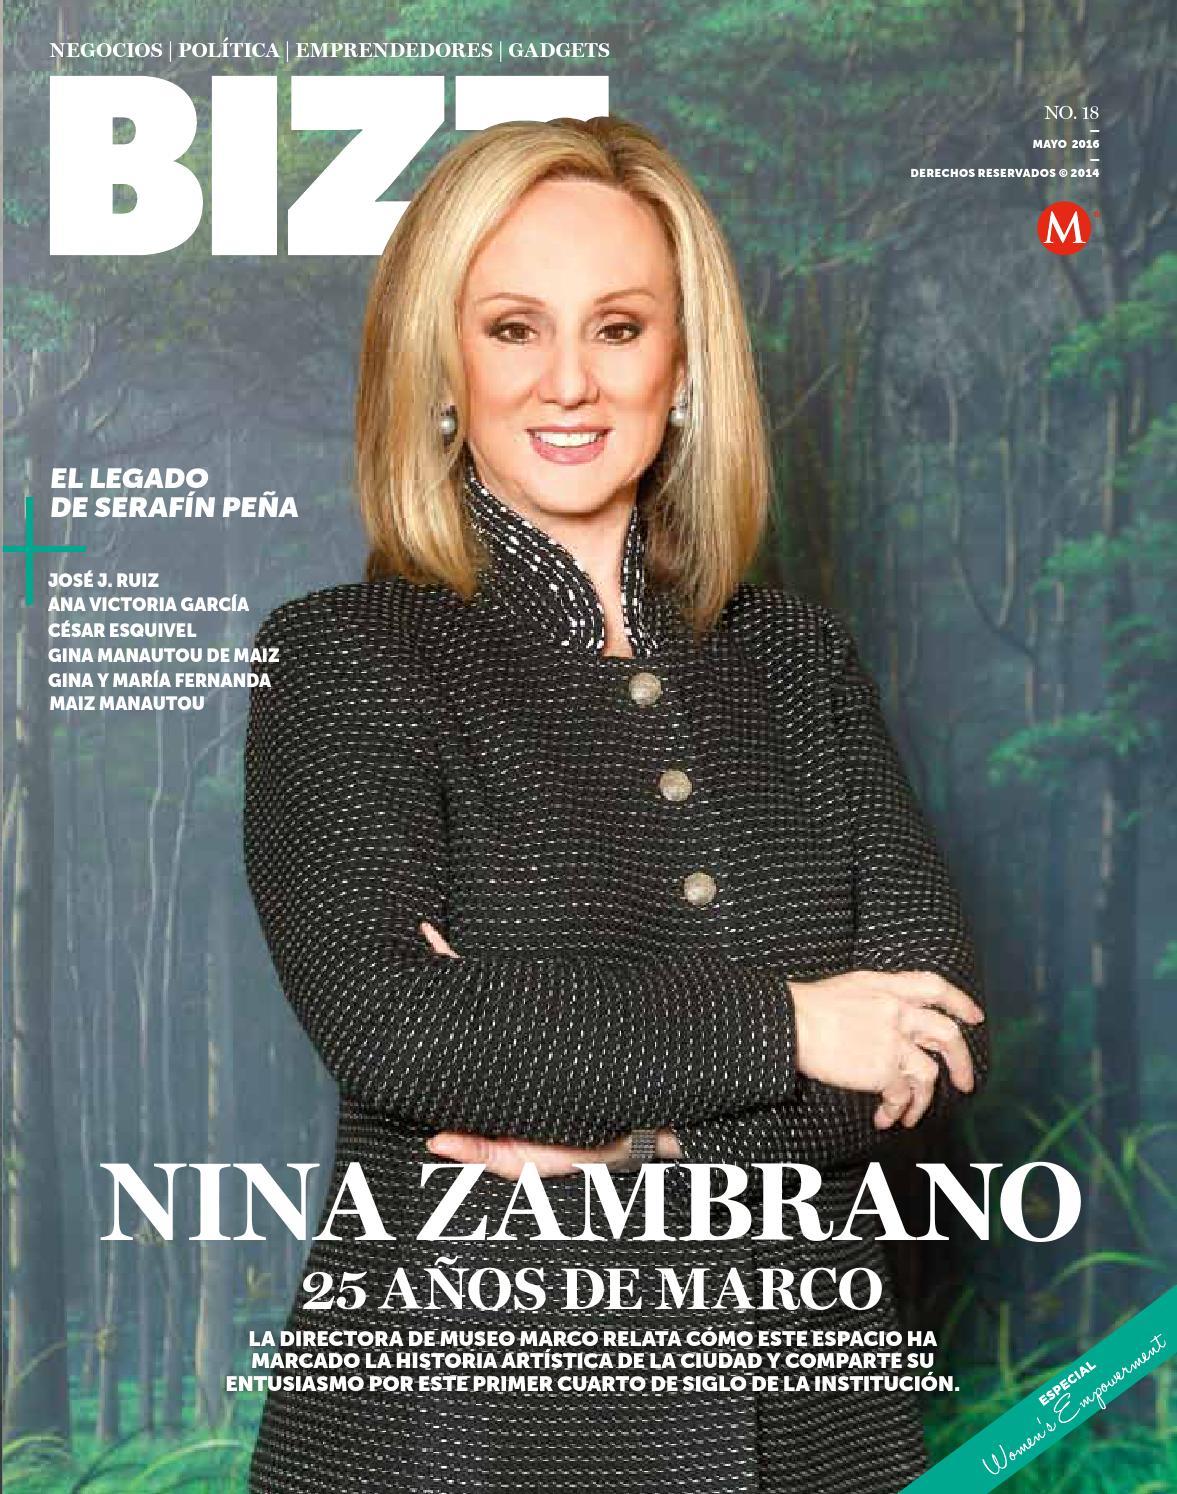 Bizz, núm. 18, may/2016 by Milenio Diario Monterrey - issuu